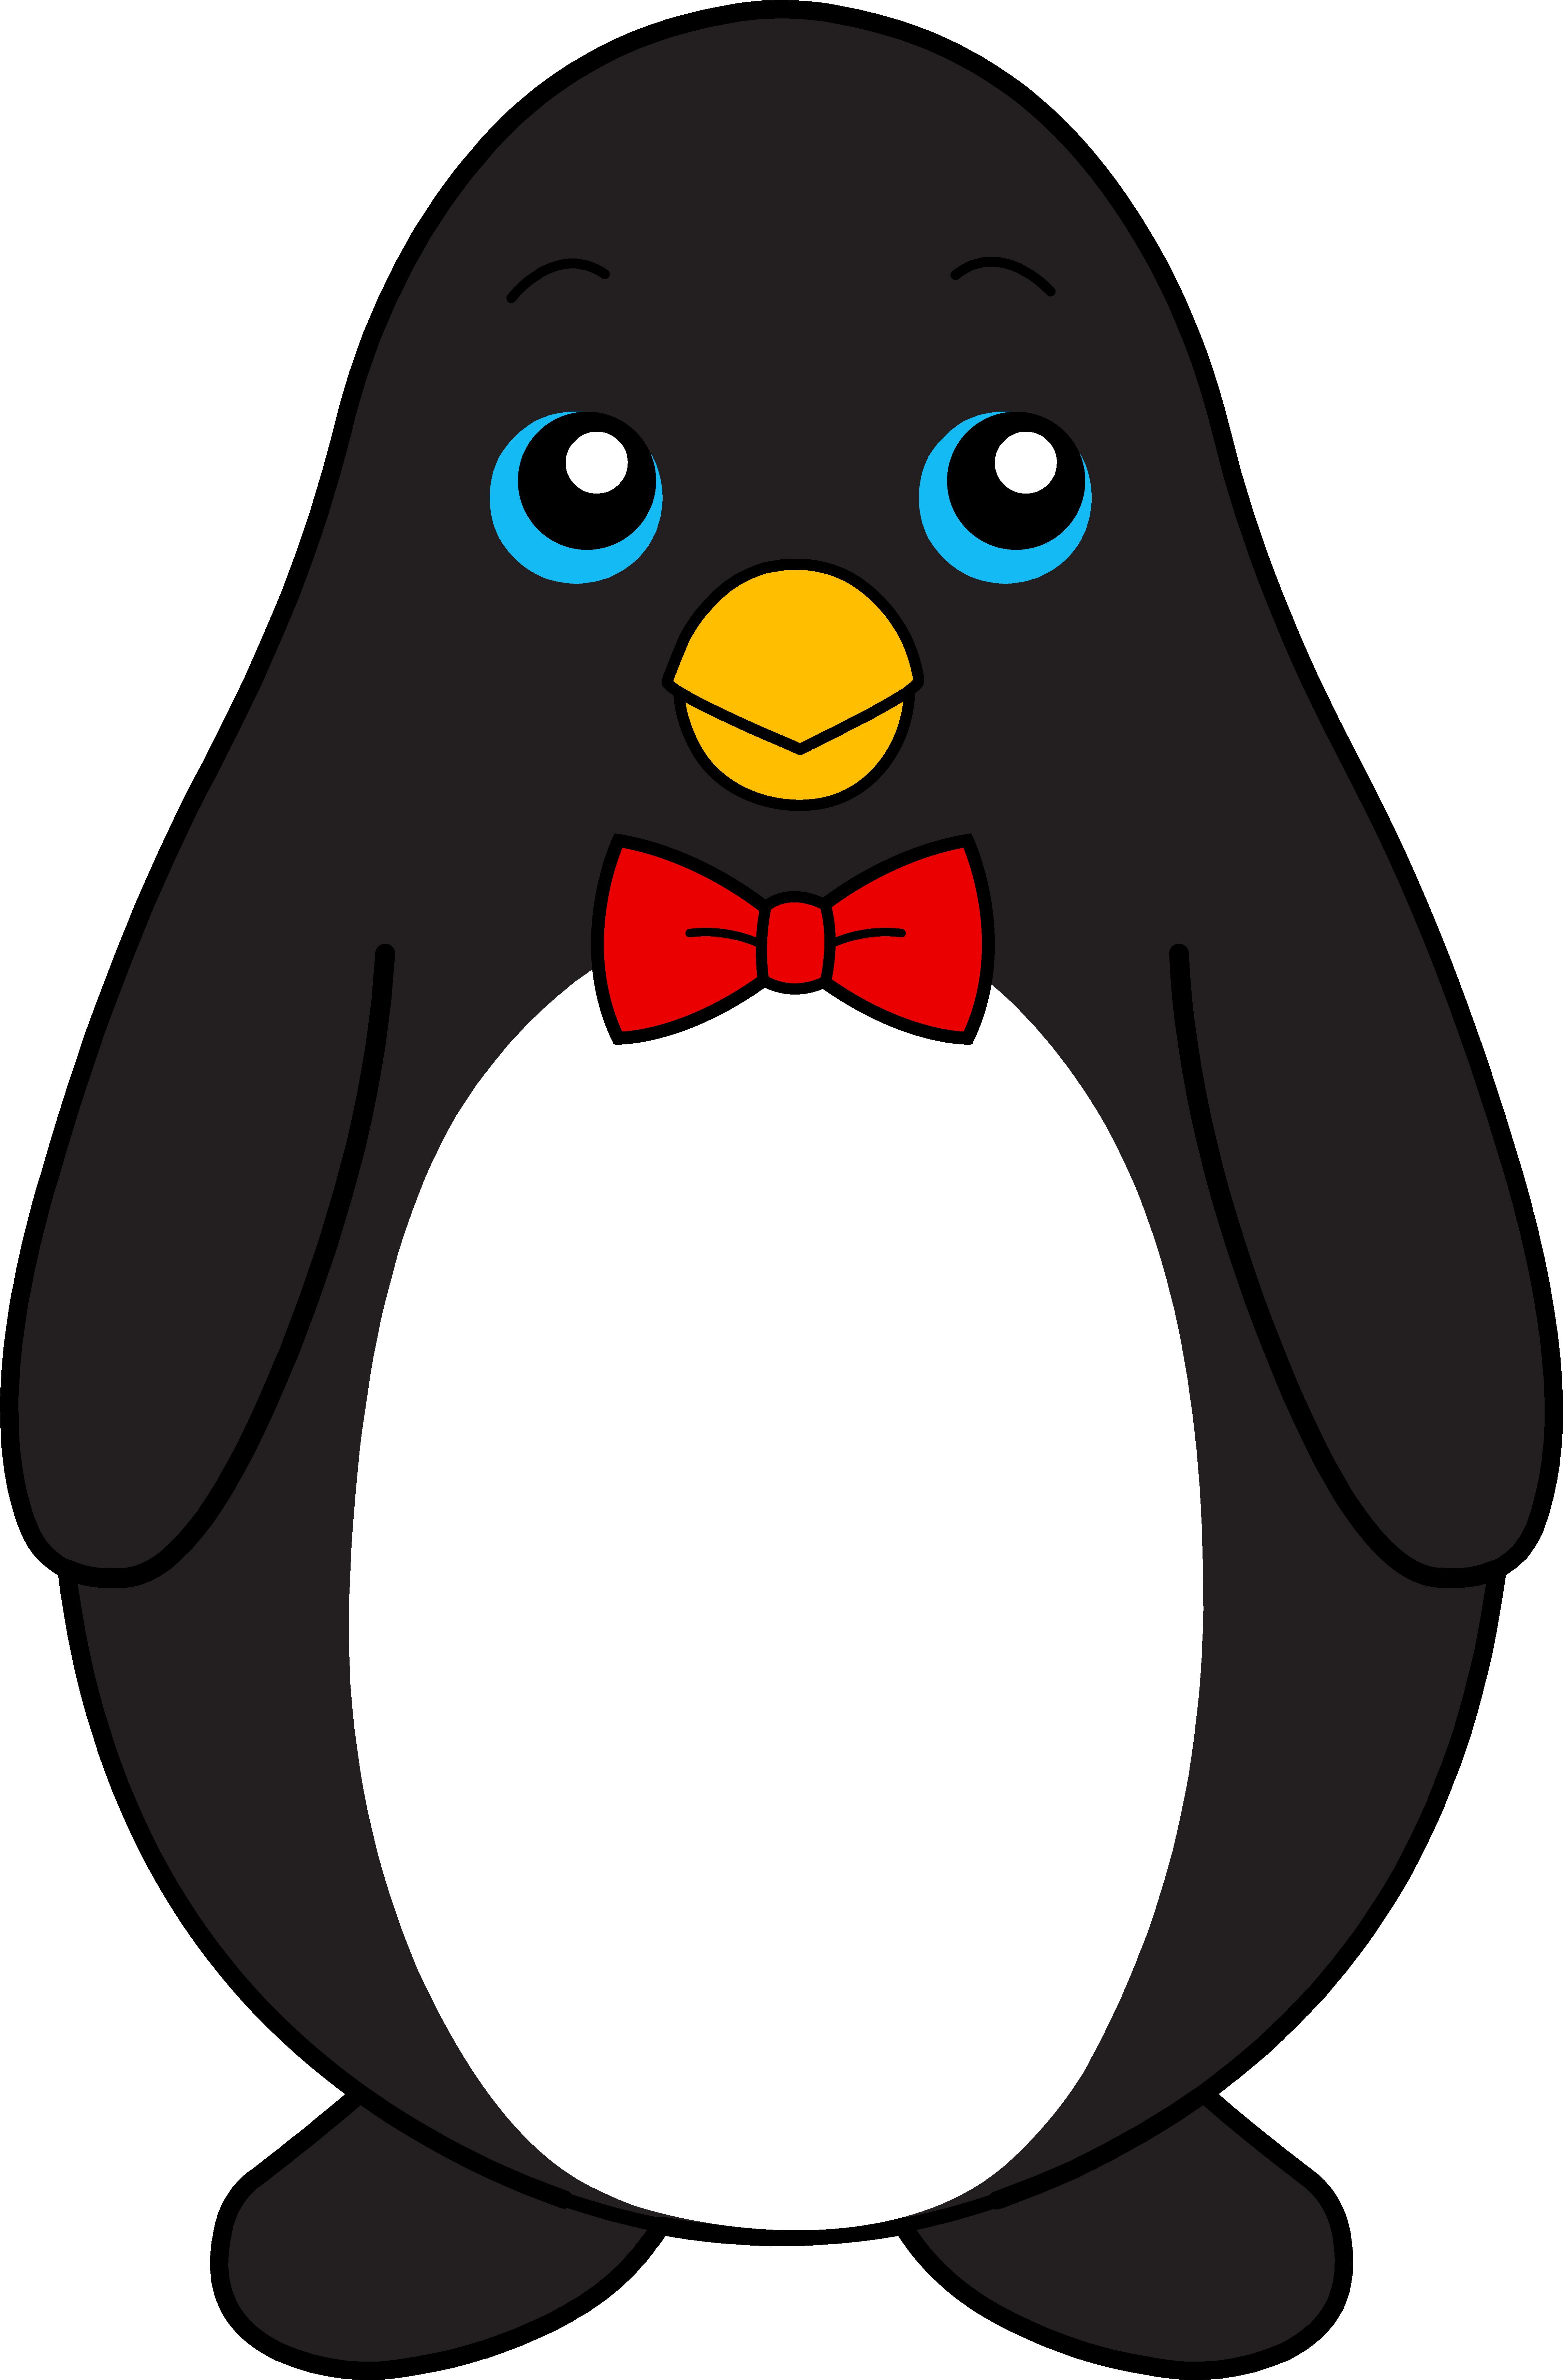 Penguin Clipart Black And White-penguin clipart black and white-9